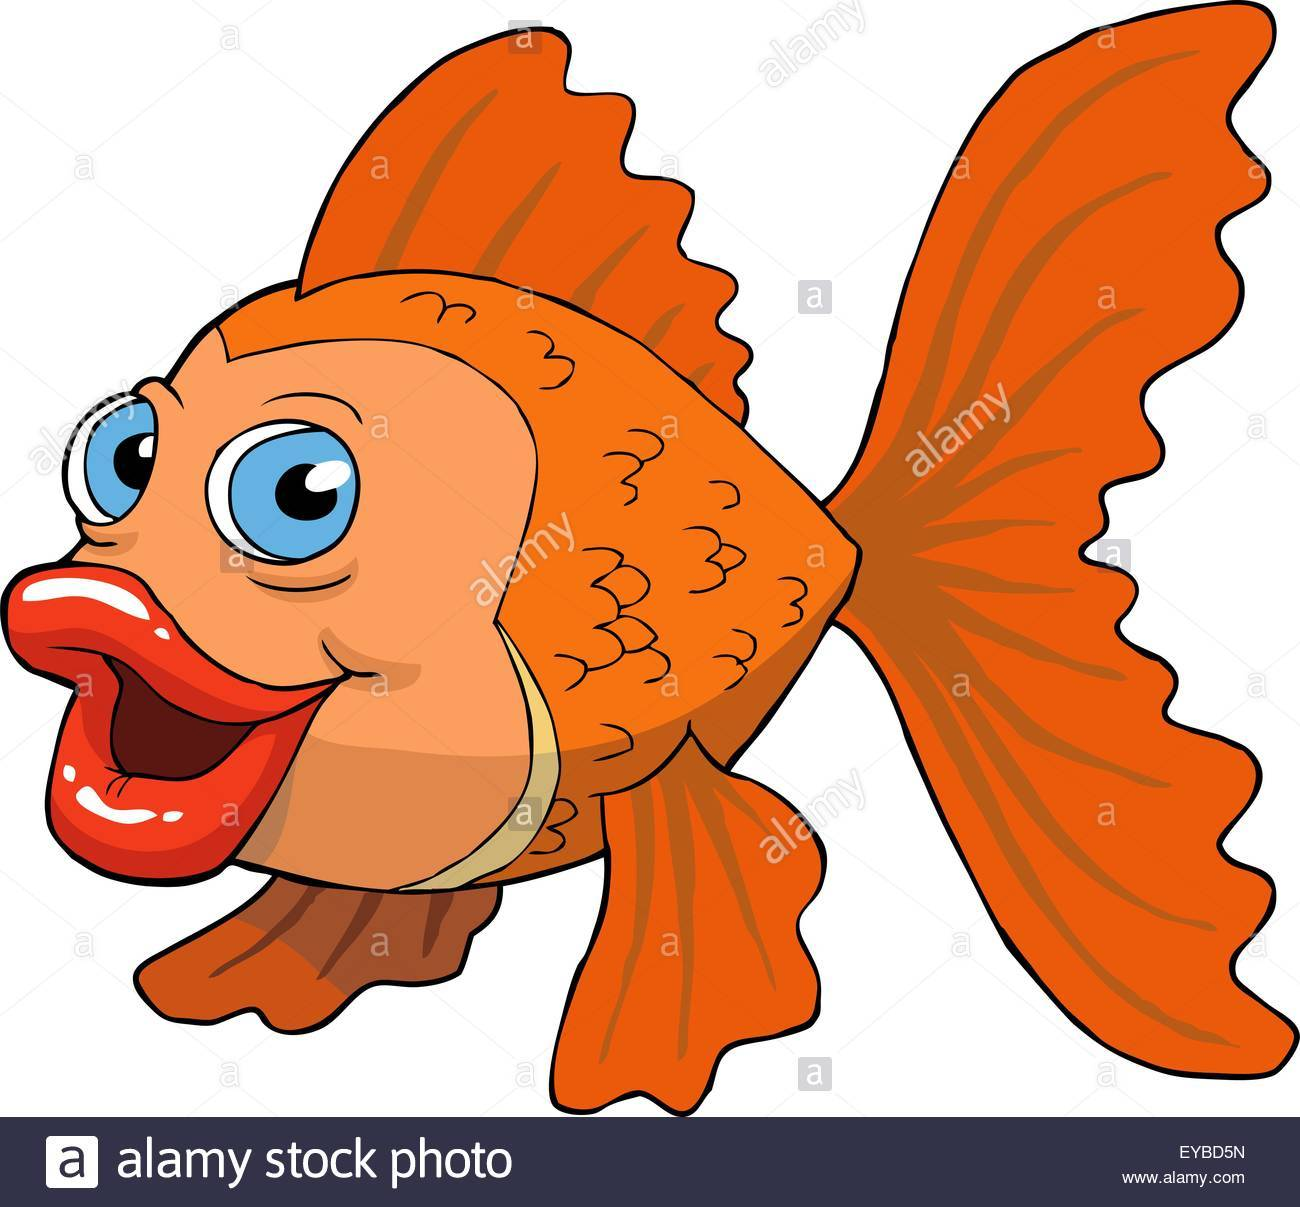 Fish lips clipart 6 » Clipart Portal.